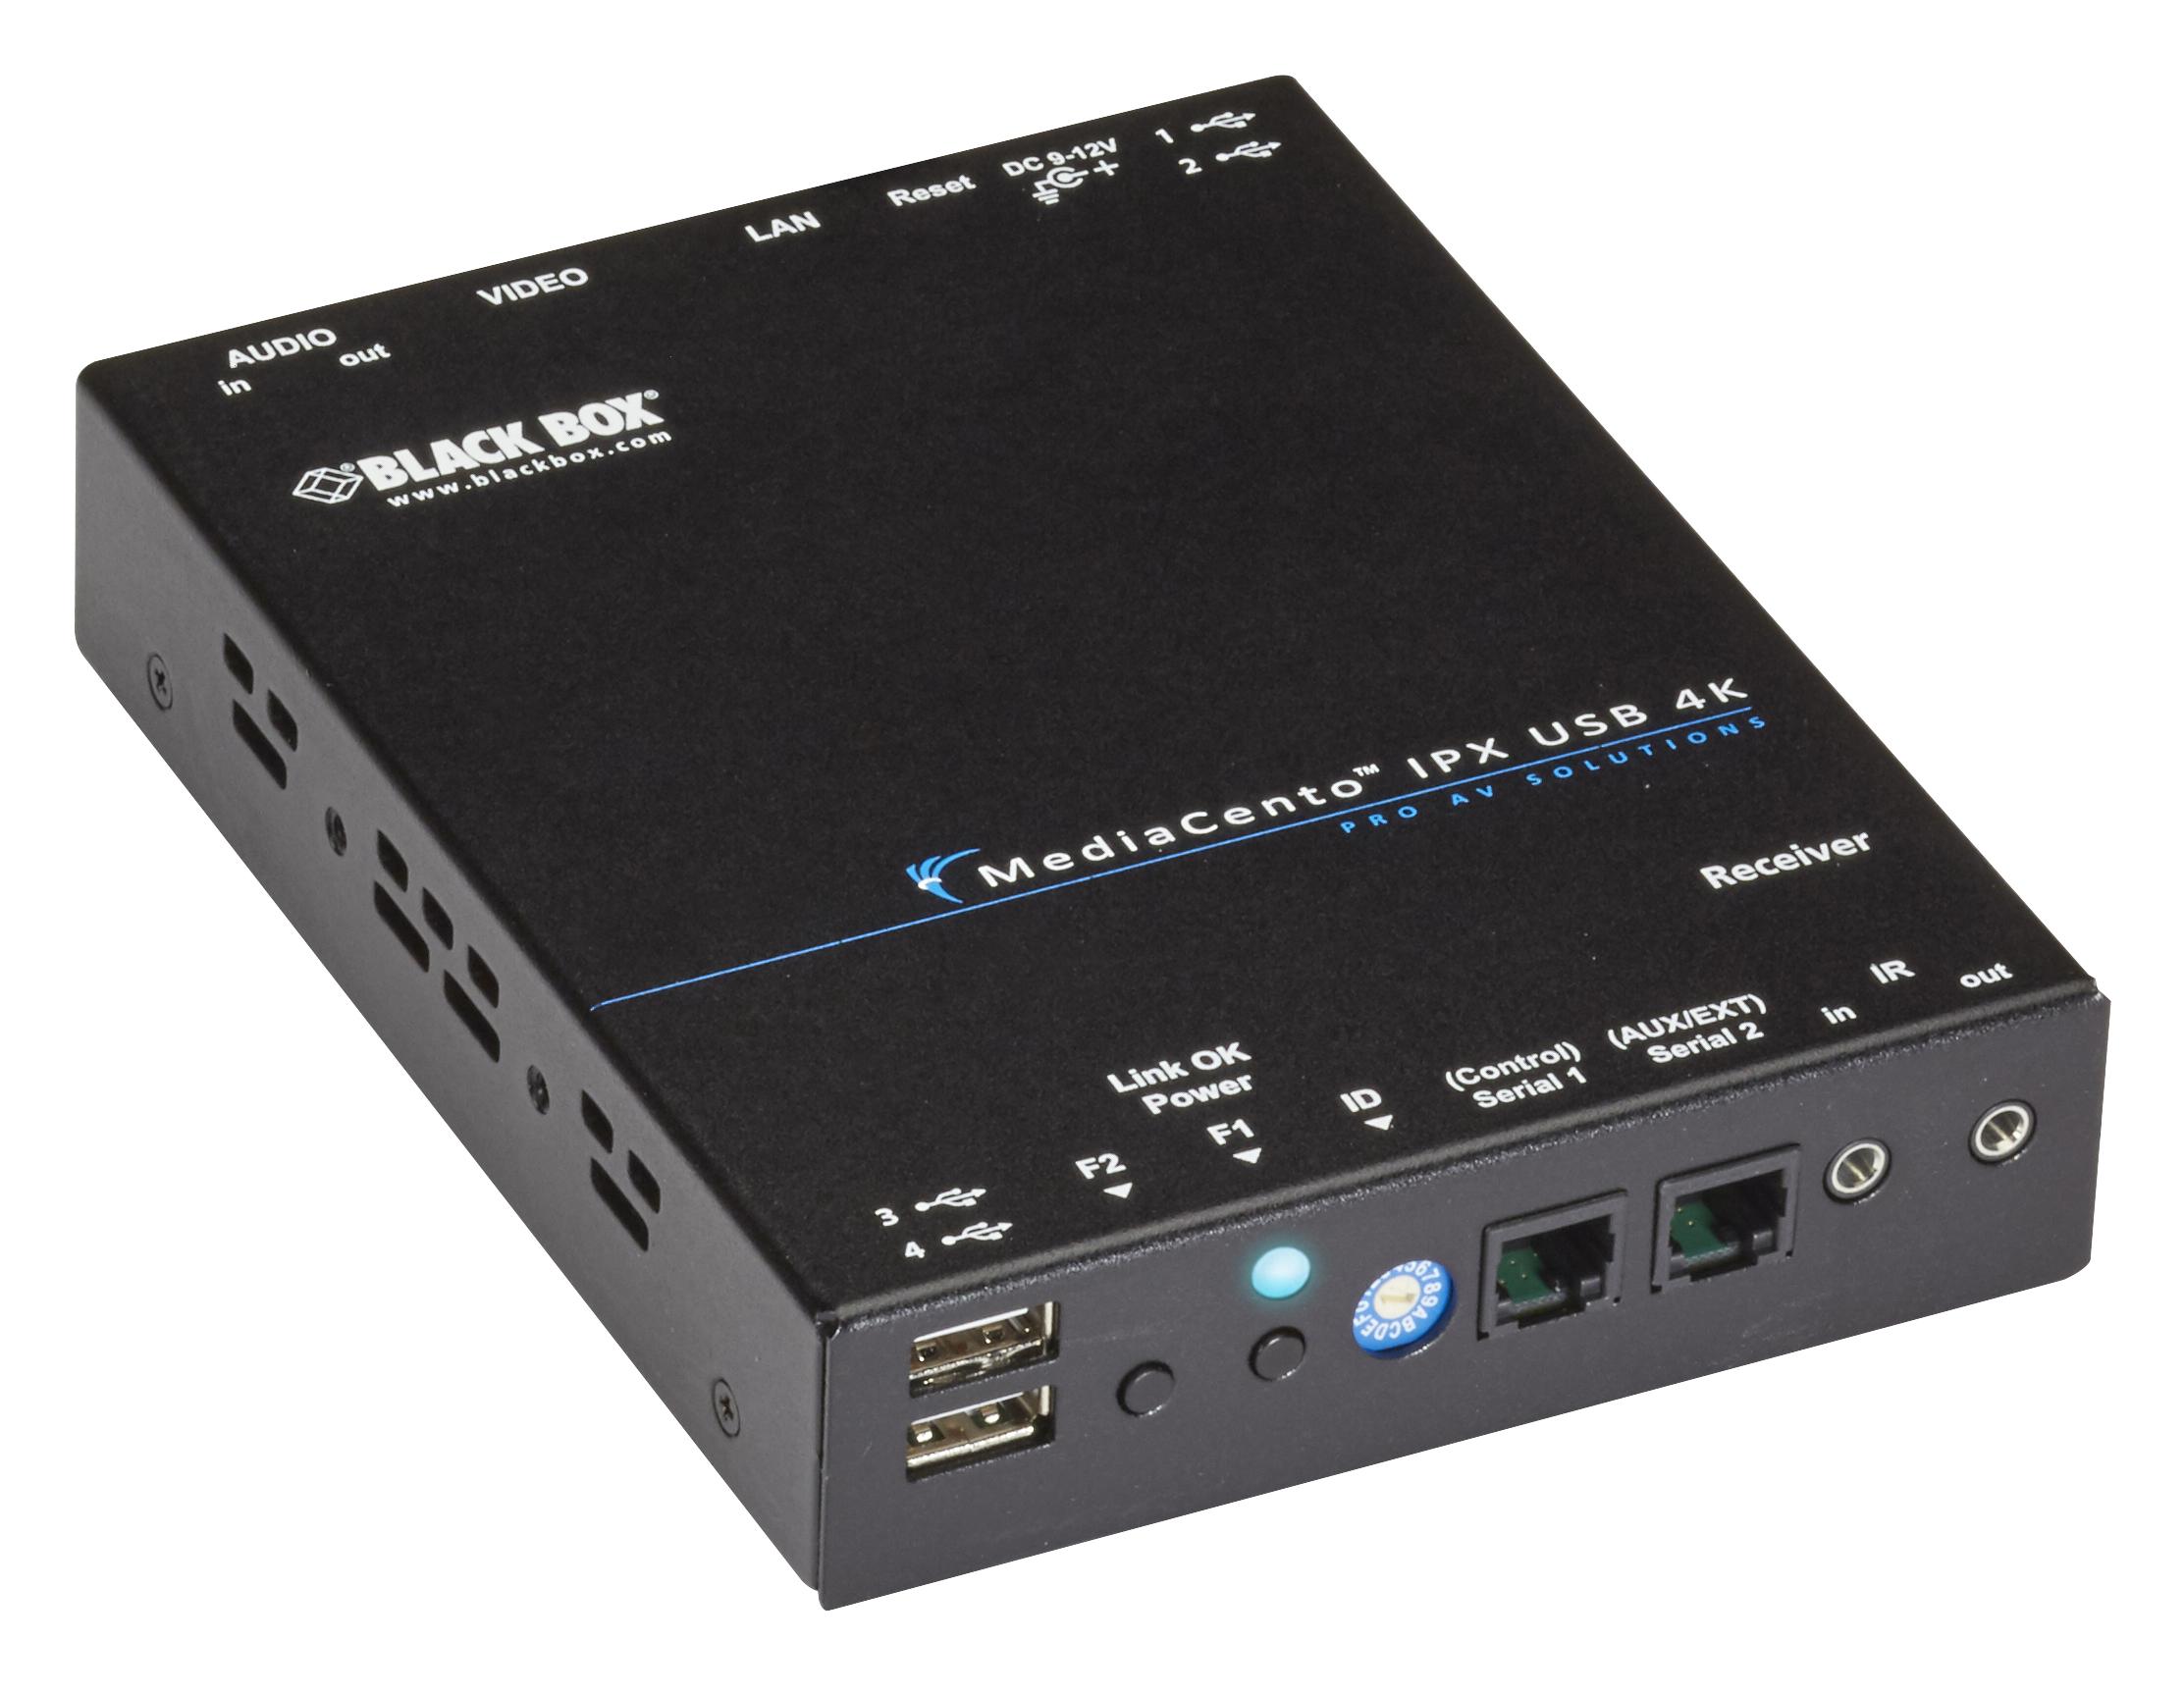 MediaCento IPX 4K Receiver - HDMI, IP, USB